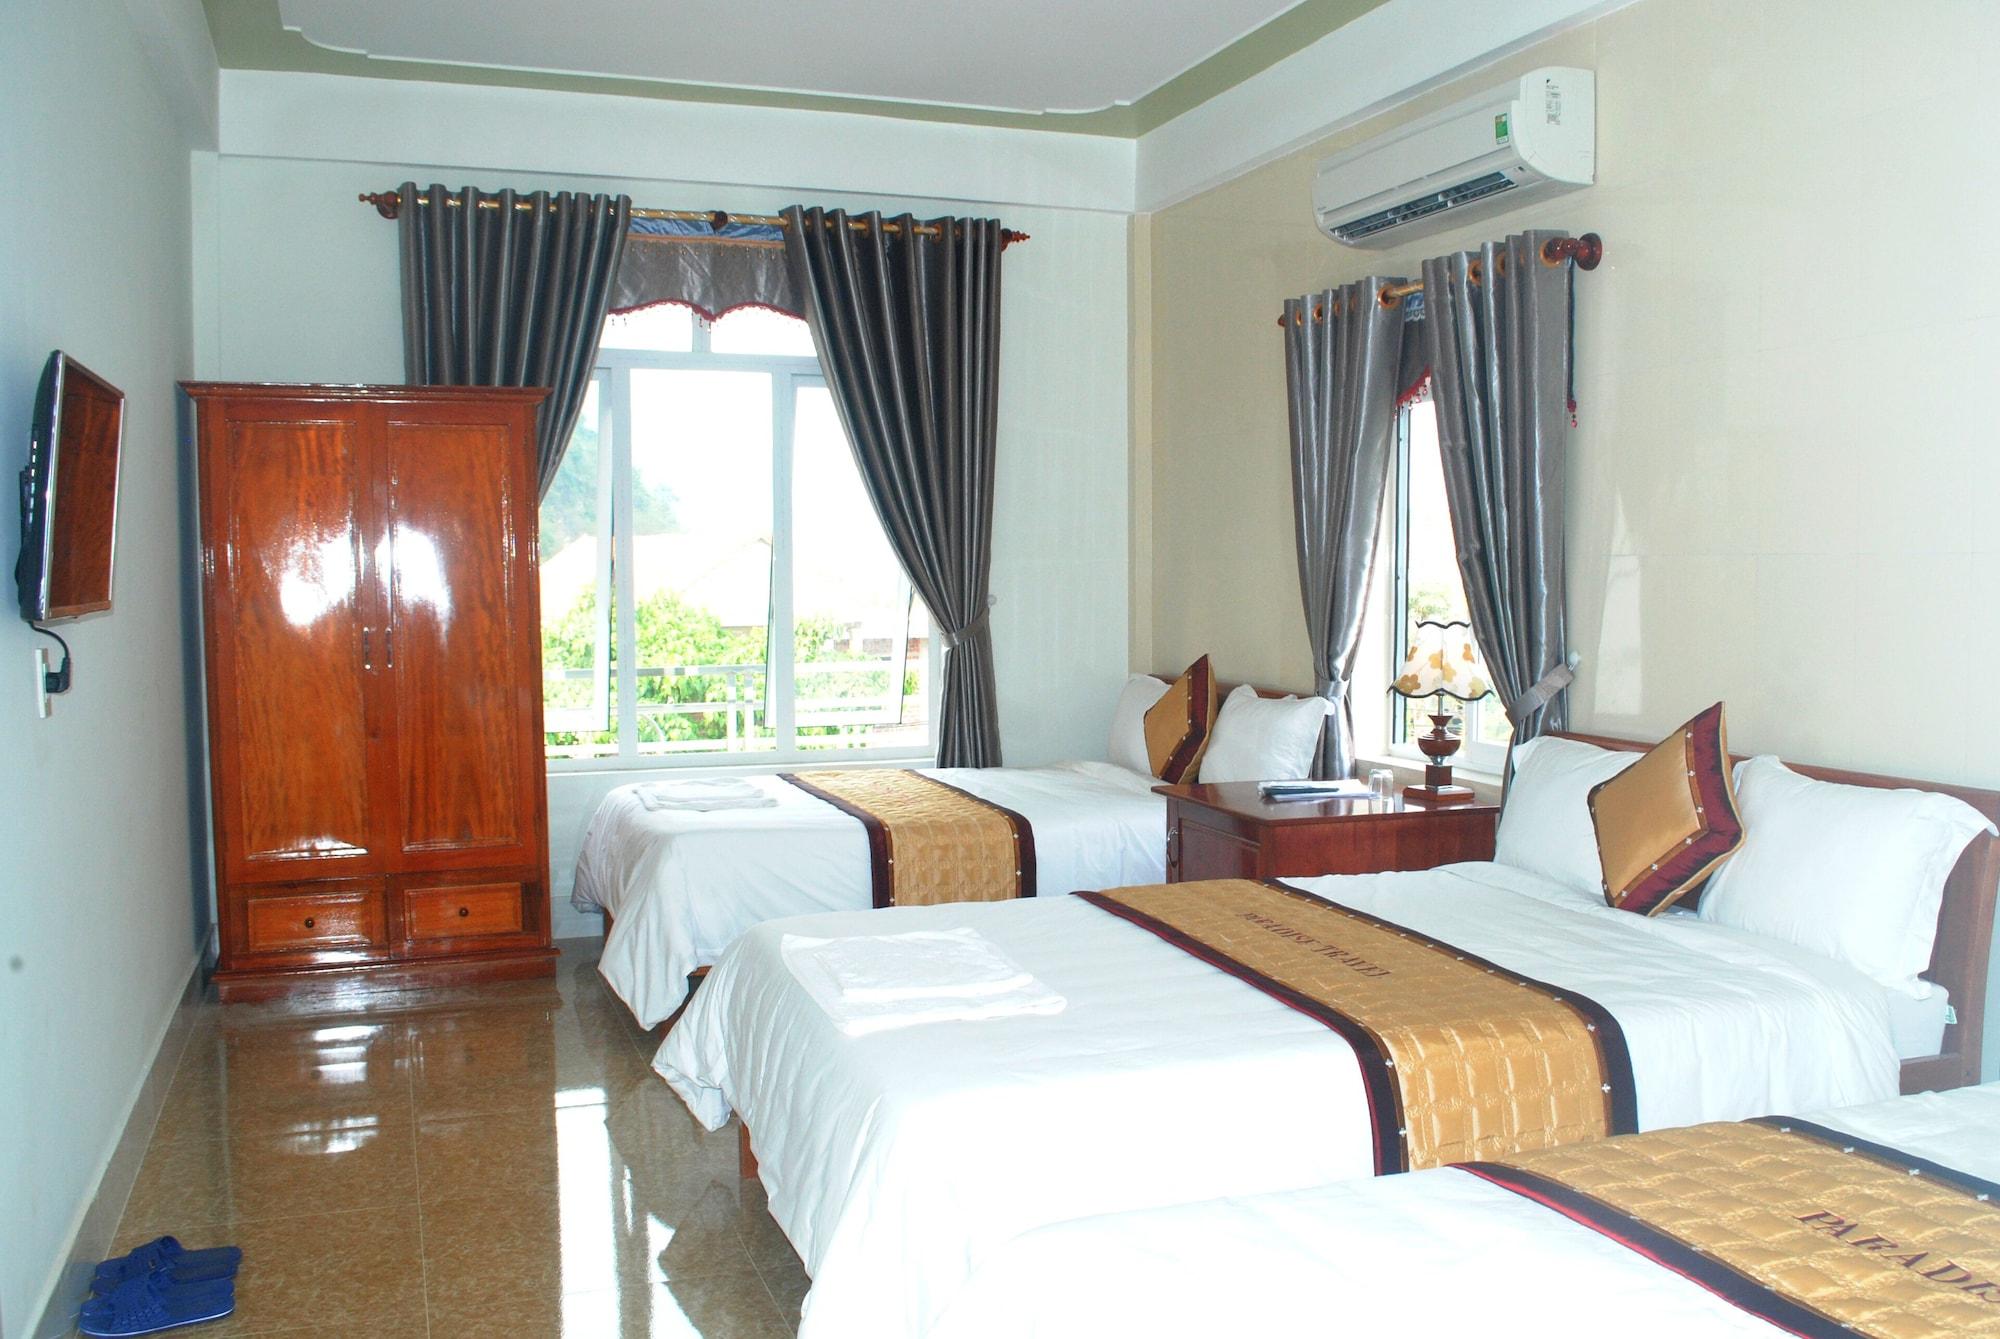 Paradise Hotel, Bố Trạch